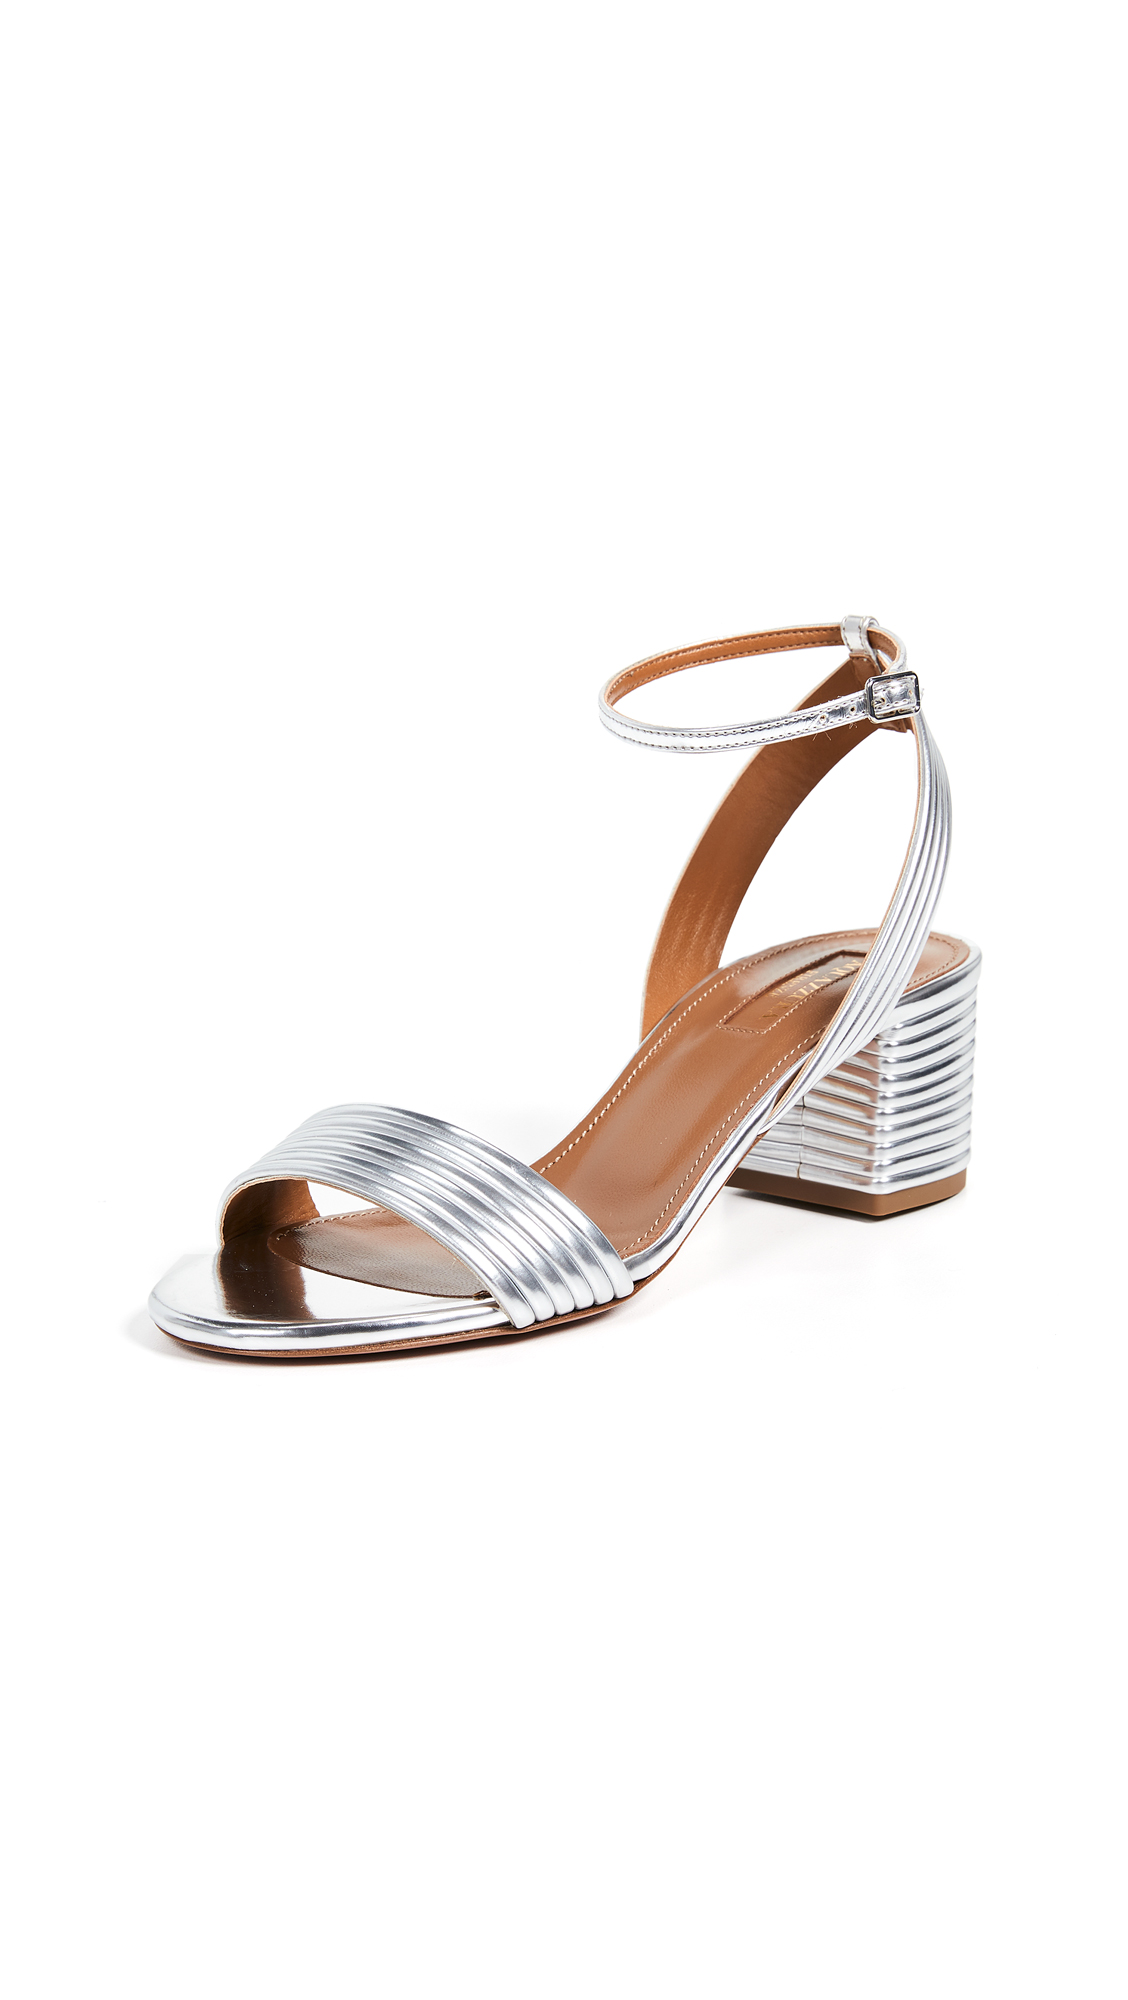 Aquazzura Sundance 50 Sandals - Silver